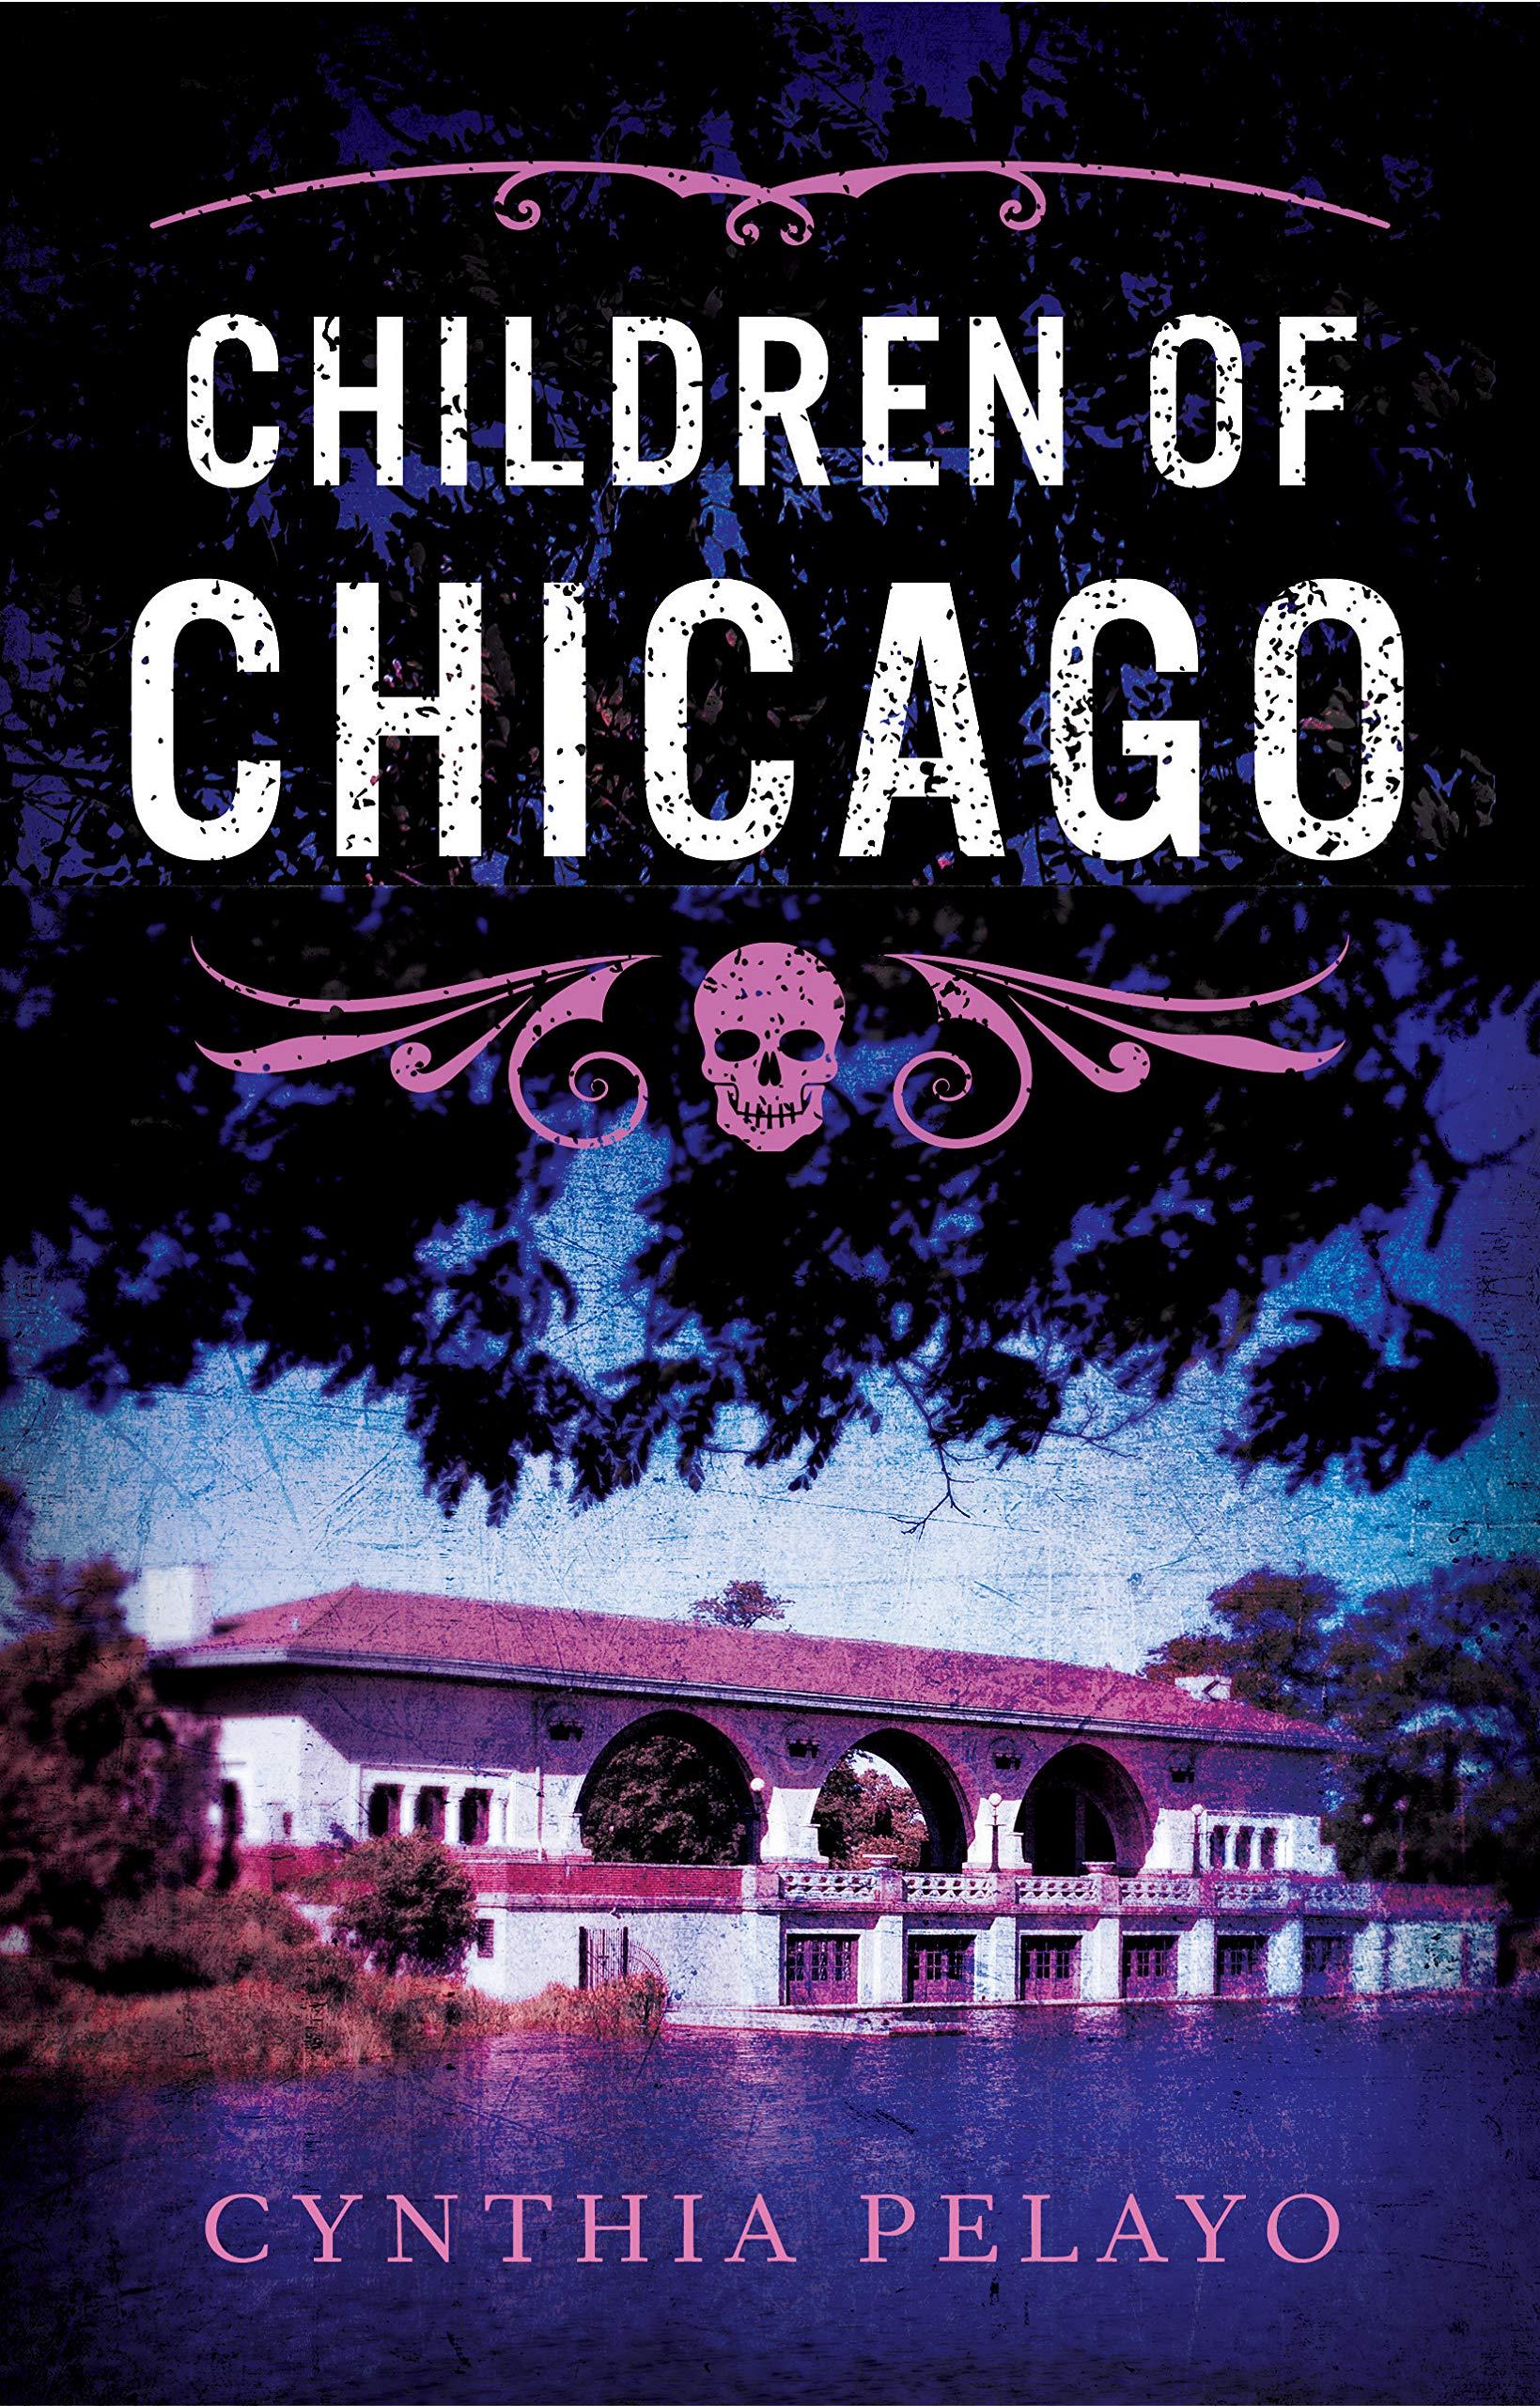 Children of Chicago by Cynthia Pelayo